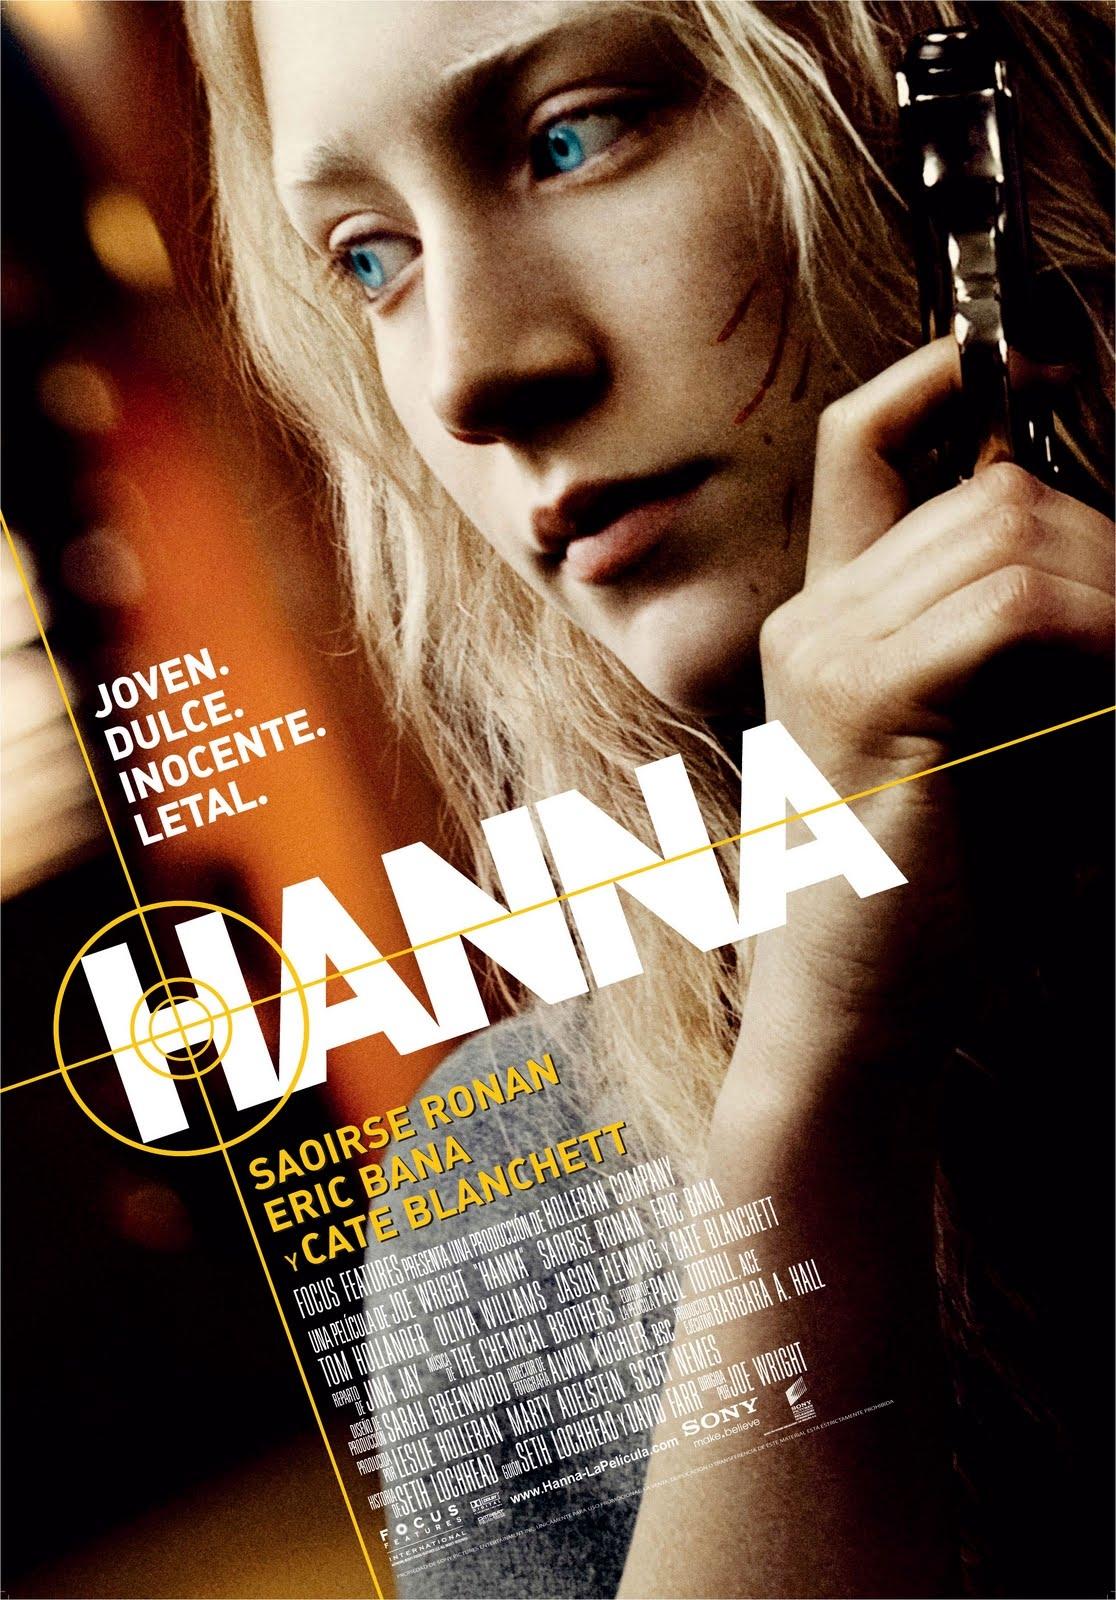 http://2.bp.blogspot.com/--Ar8TgO5dgA/Tf4myjMTmtI/AAAAAAAACUE/wW_VZJLcDZo/s1600/hanna-poster.JPG